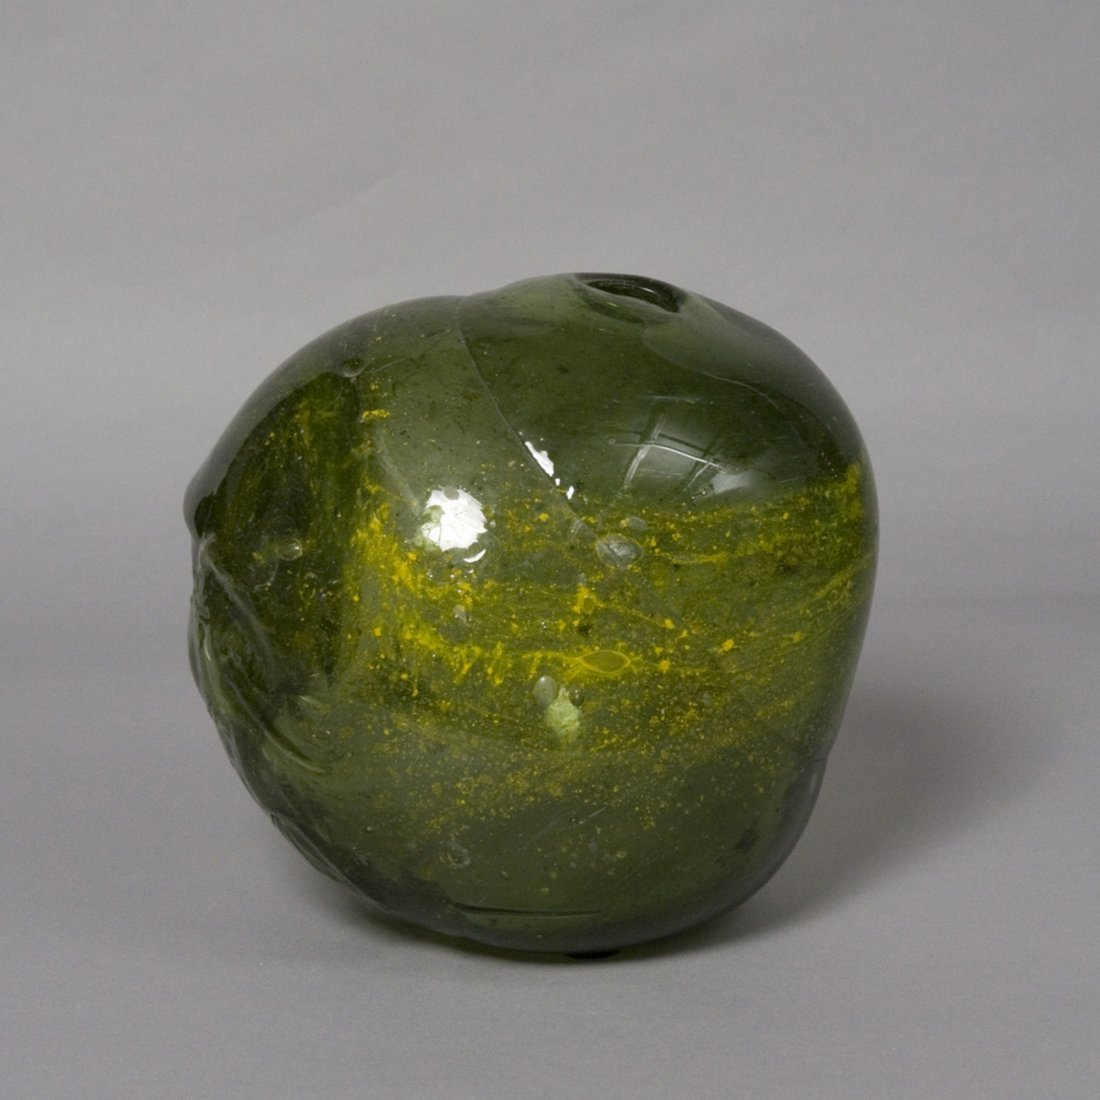 Studio Glass Vase by Fritz Dreisbach